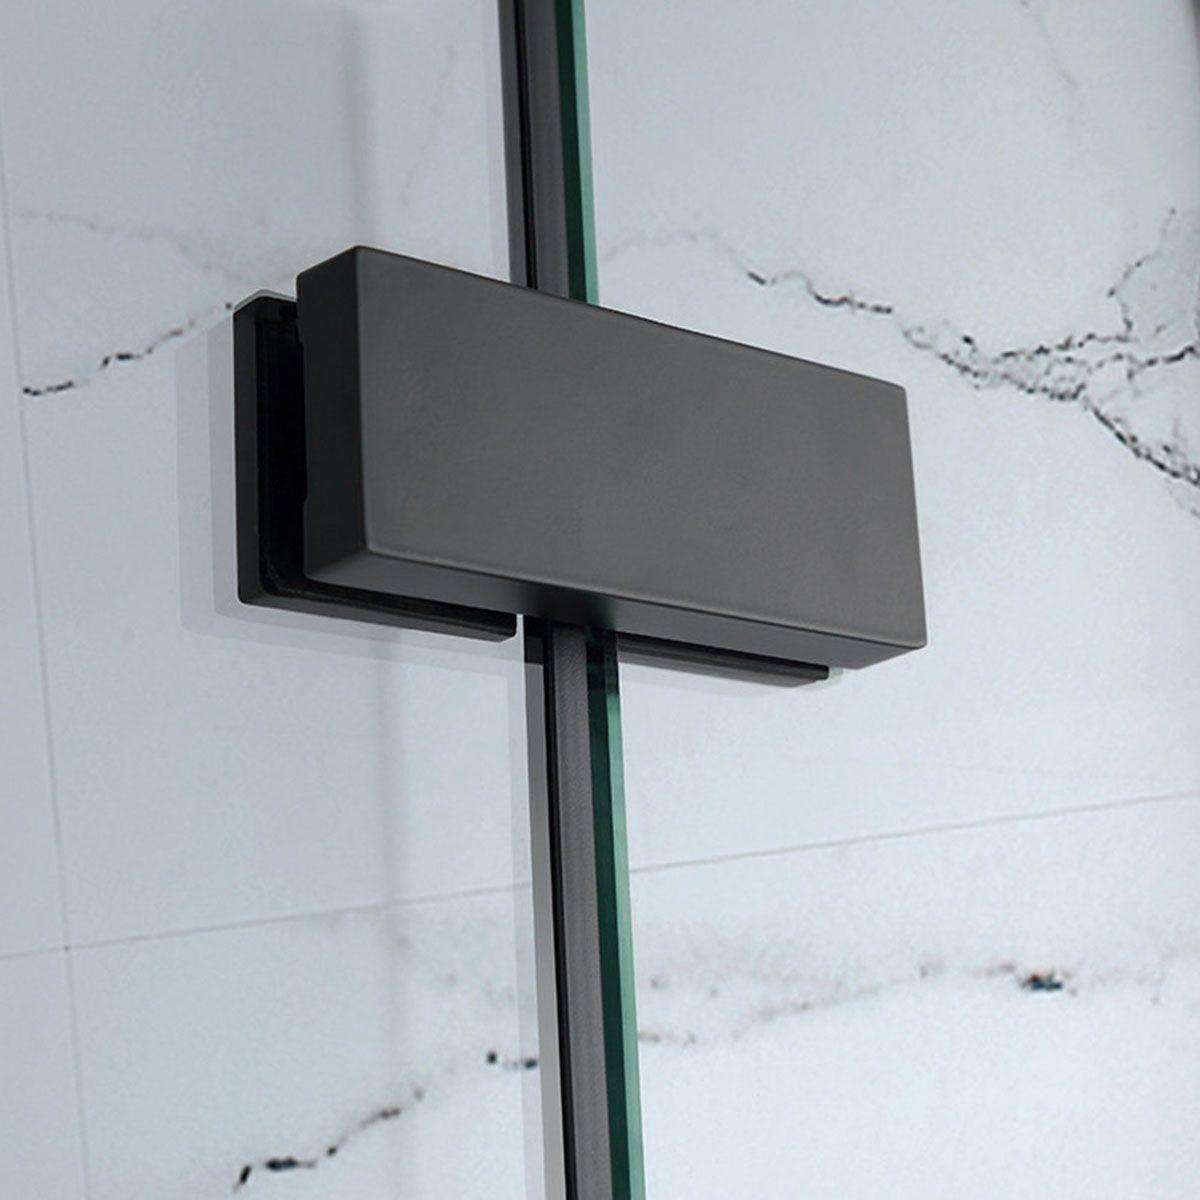 Frontline Aquaglass Onyx Black Hinged Shower Enclosure Hinge